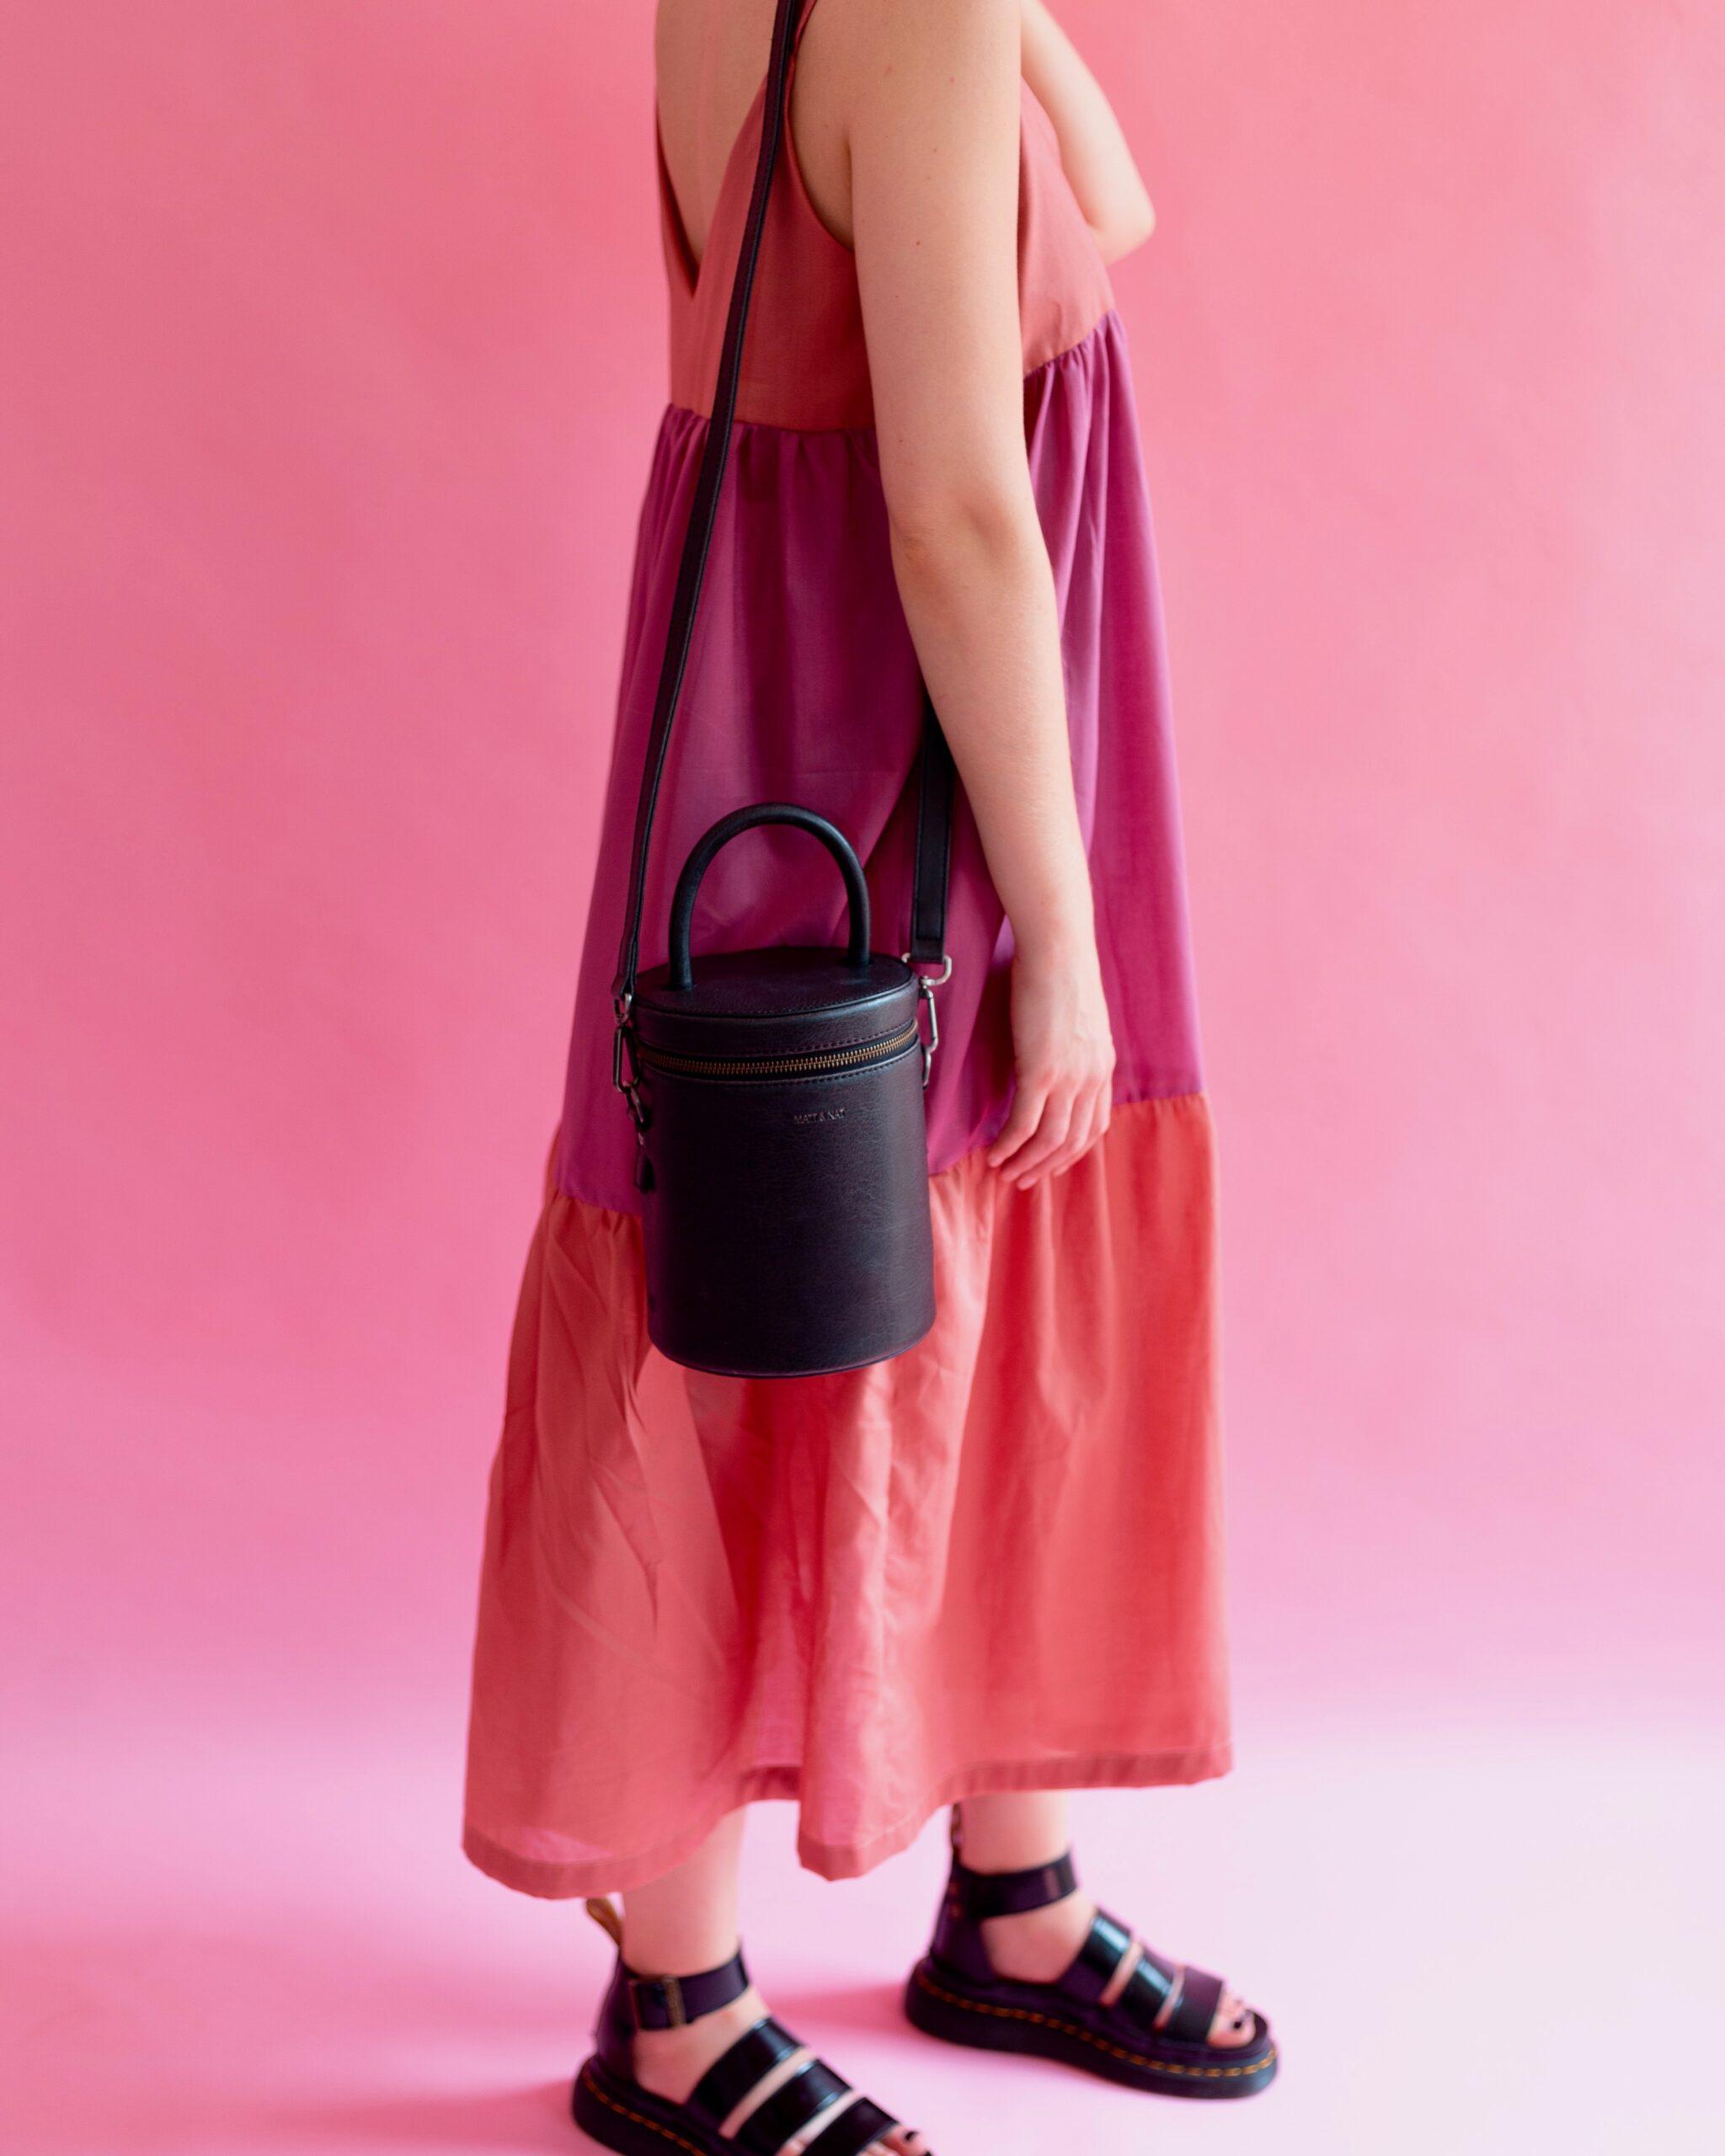 organic cotton smock dress, full length in pink and orange